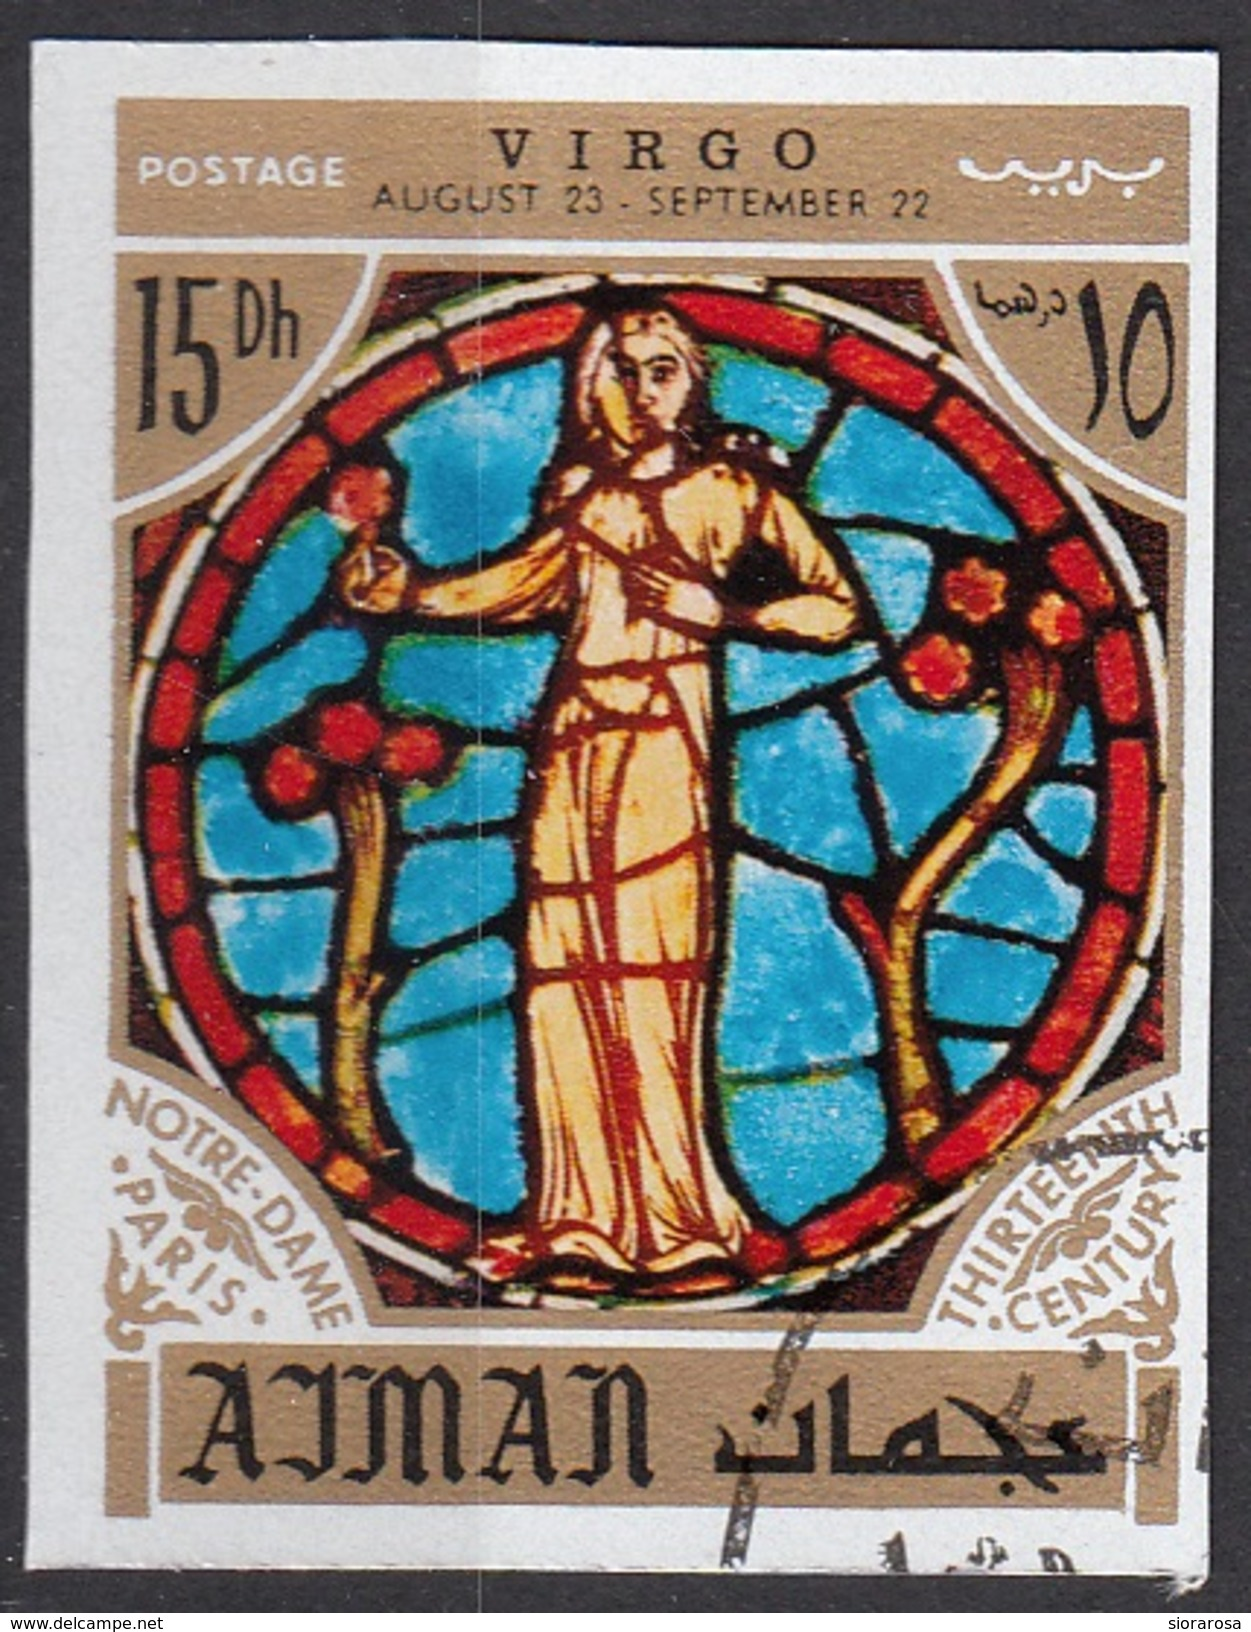 774 Ajman 1971 Segni Zodiaco Virgo Vergine - Stainled Glass Window Vetrata Notre Dame Imperf. Zodiac - Vetri & Vetrate